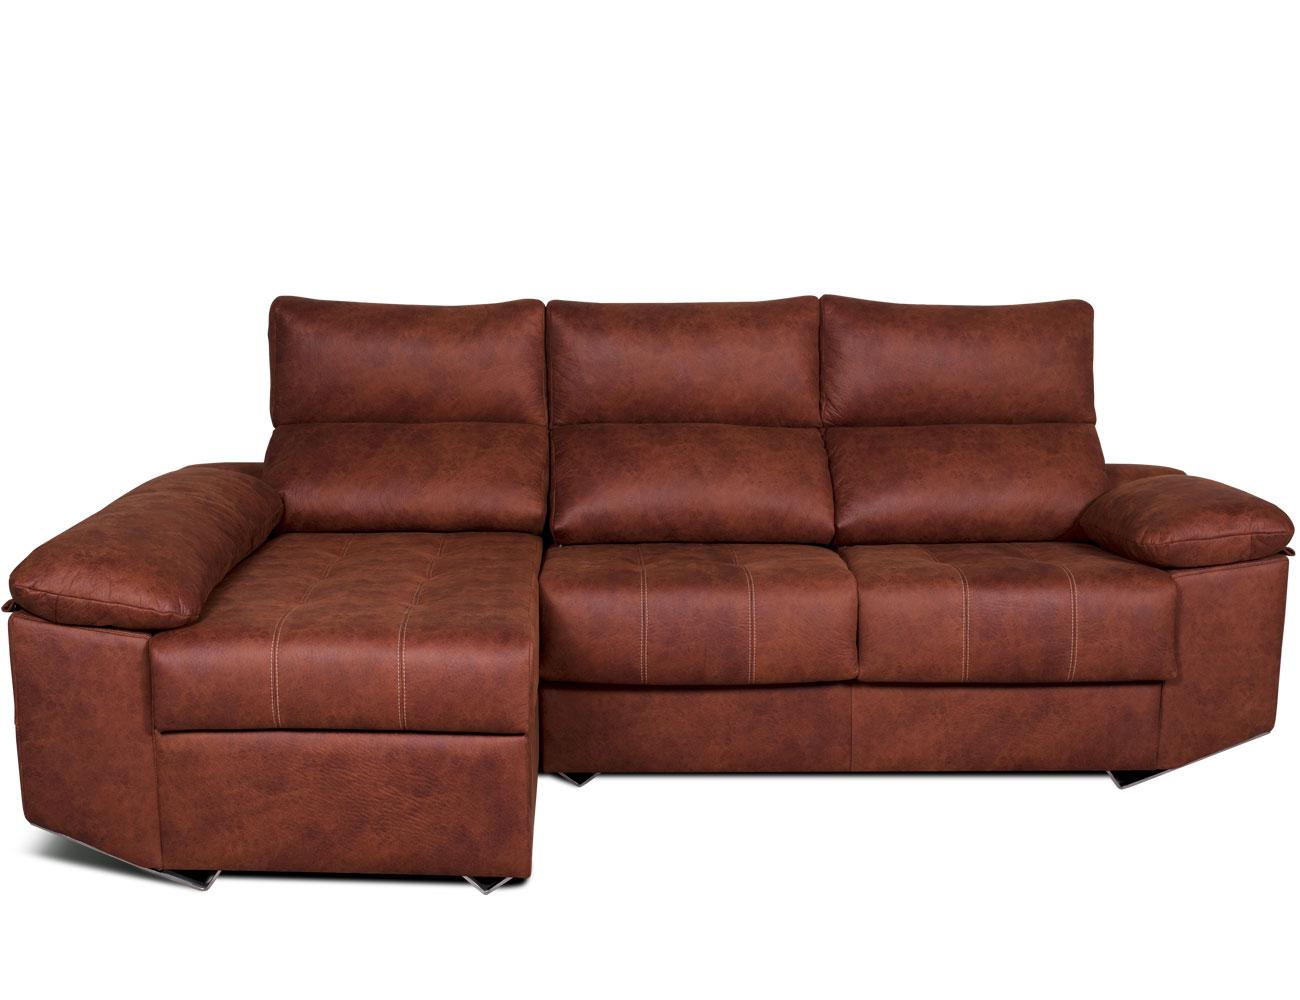 Sofa chaiselongue moderno patas forma tejido anti manchas 215